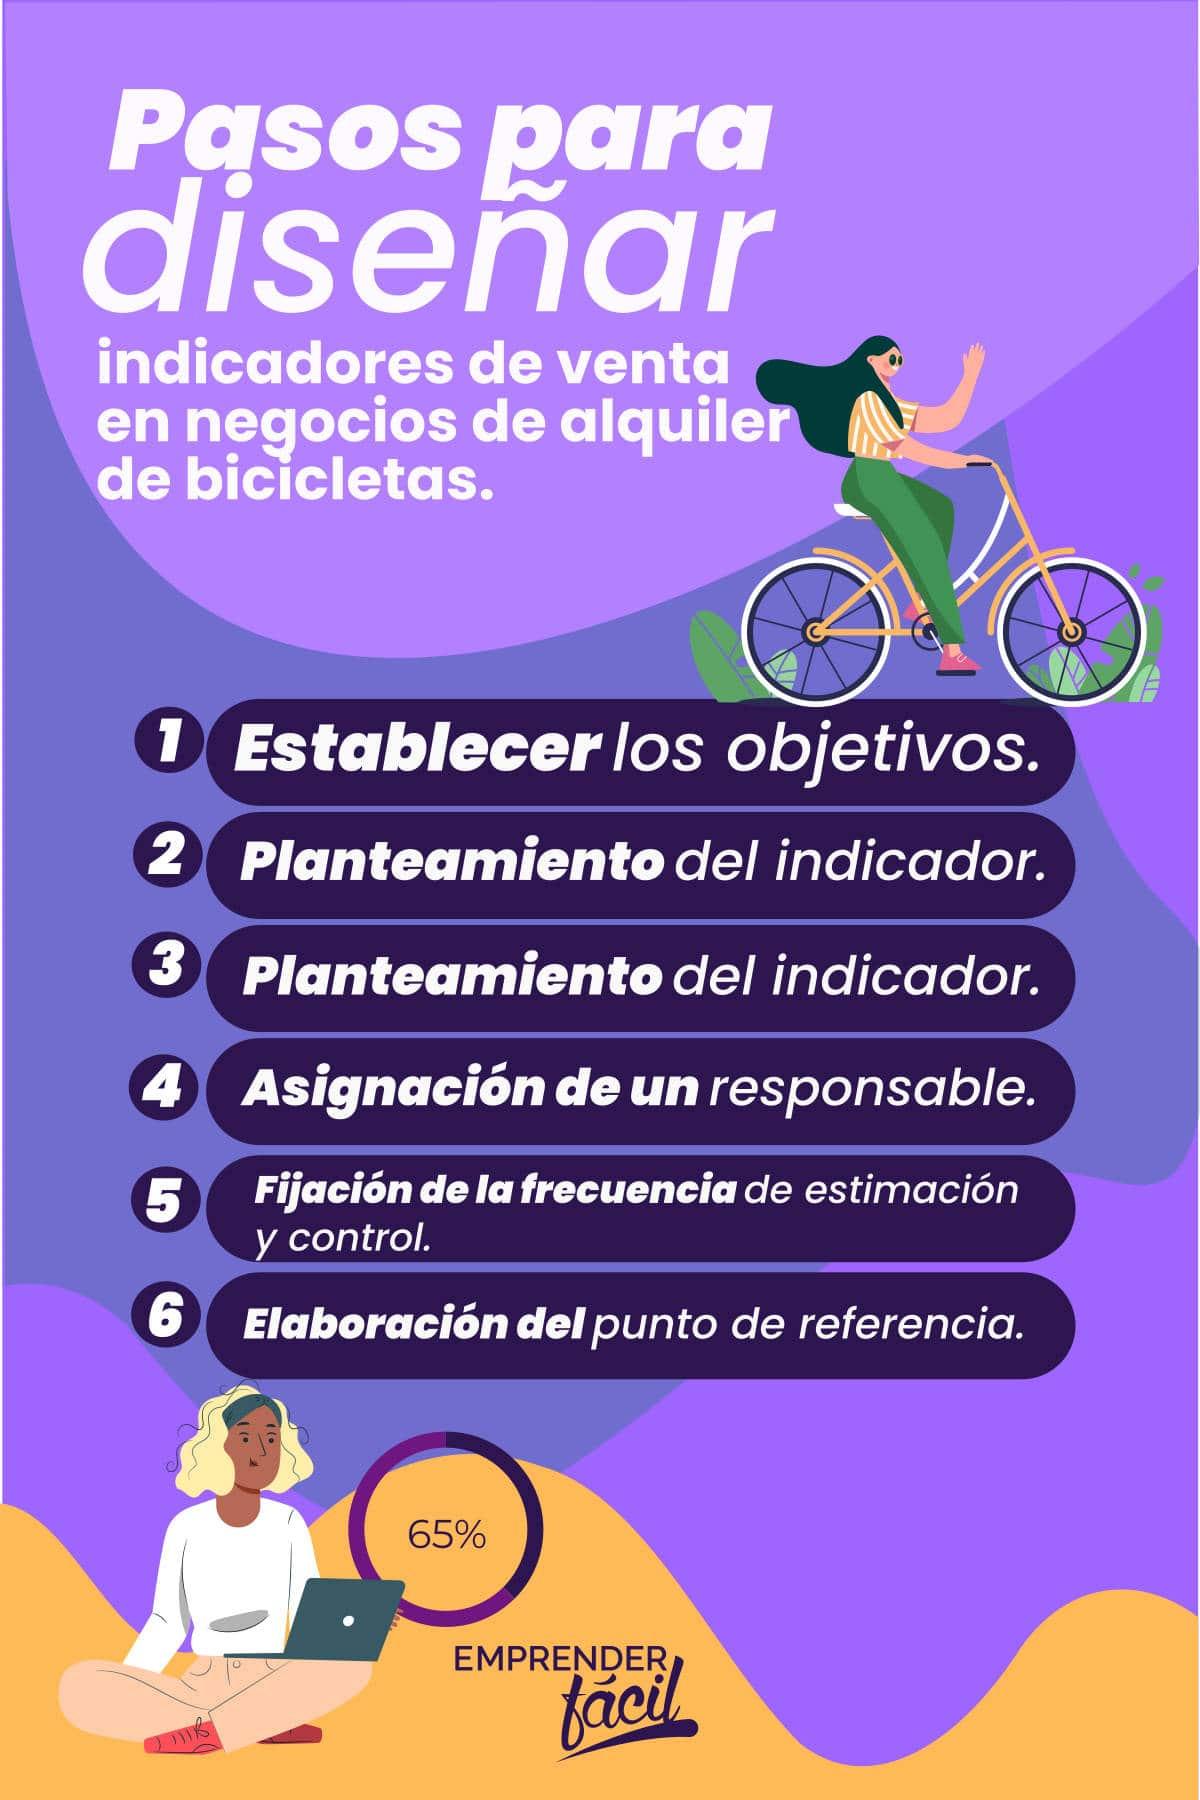 Indicadores de venta para negocios de alquiler de bicicletas 0